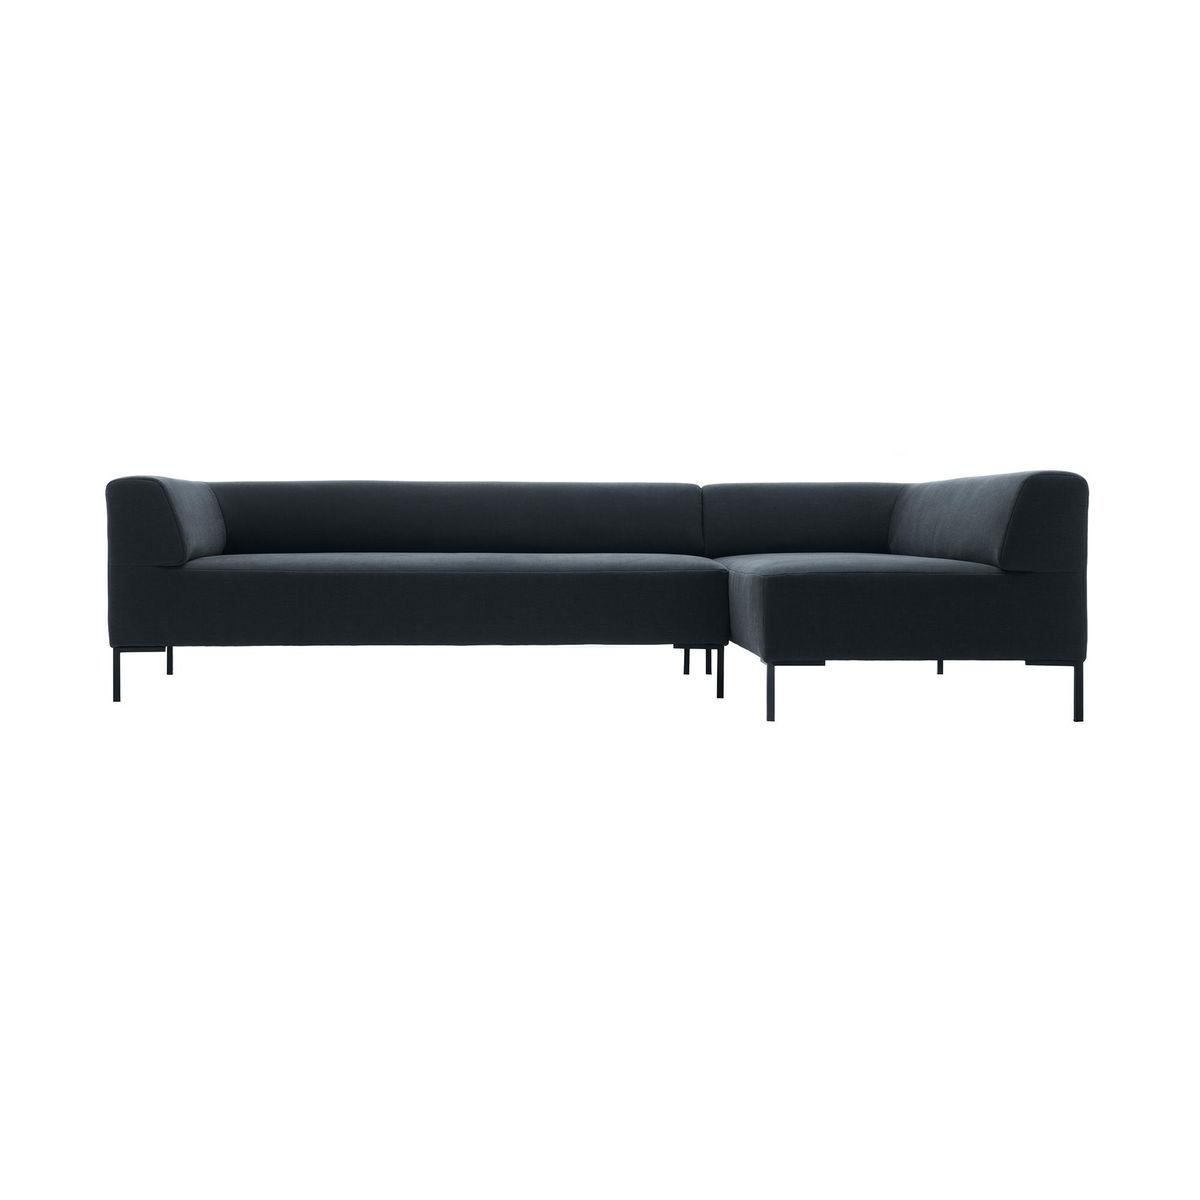 rolf benz freistil sofa no 180 klaussner slipcover 185 loungesofa 257x180cm